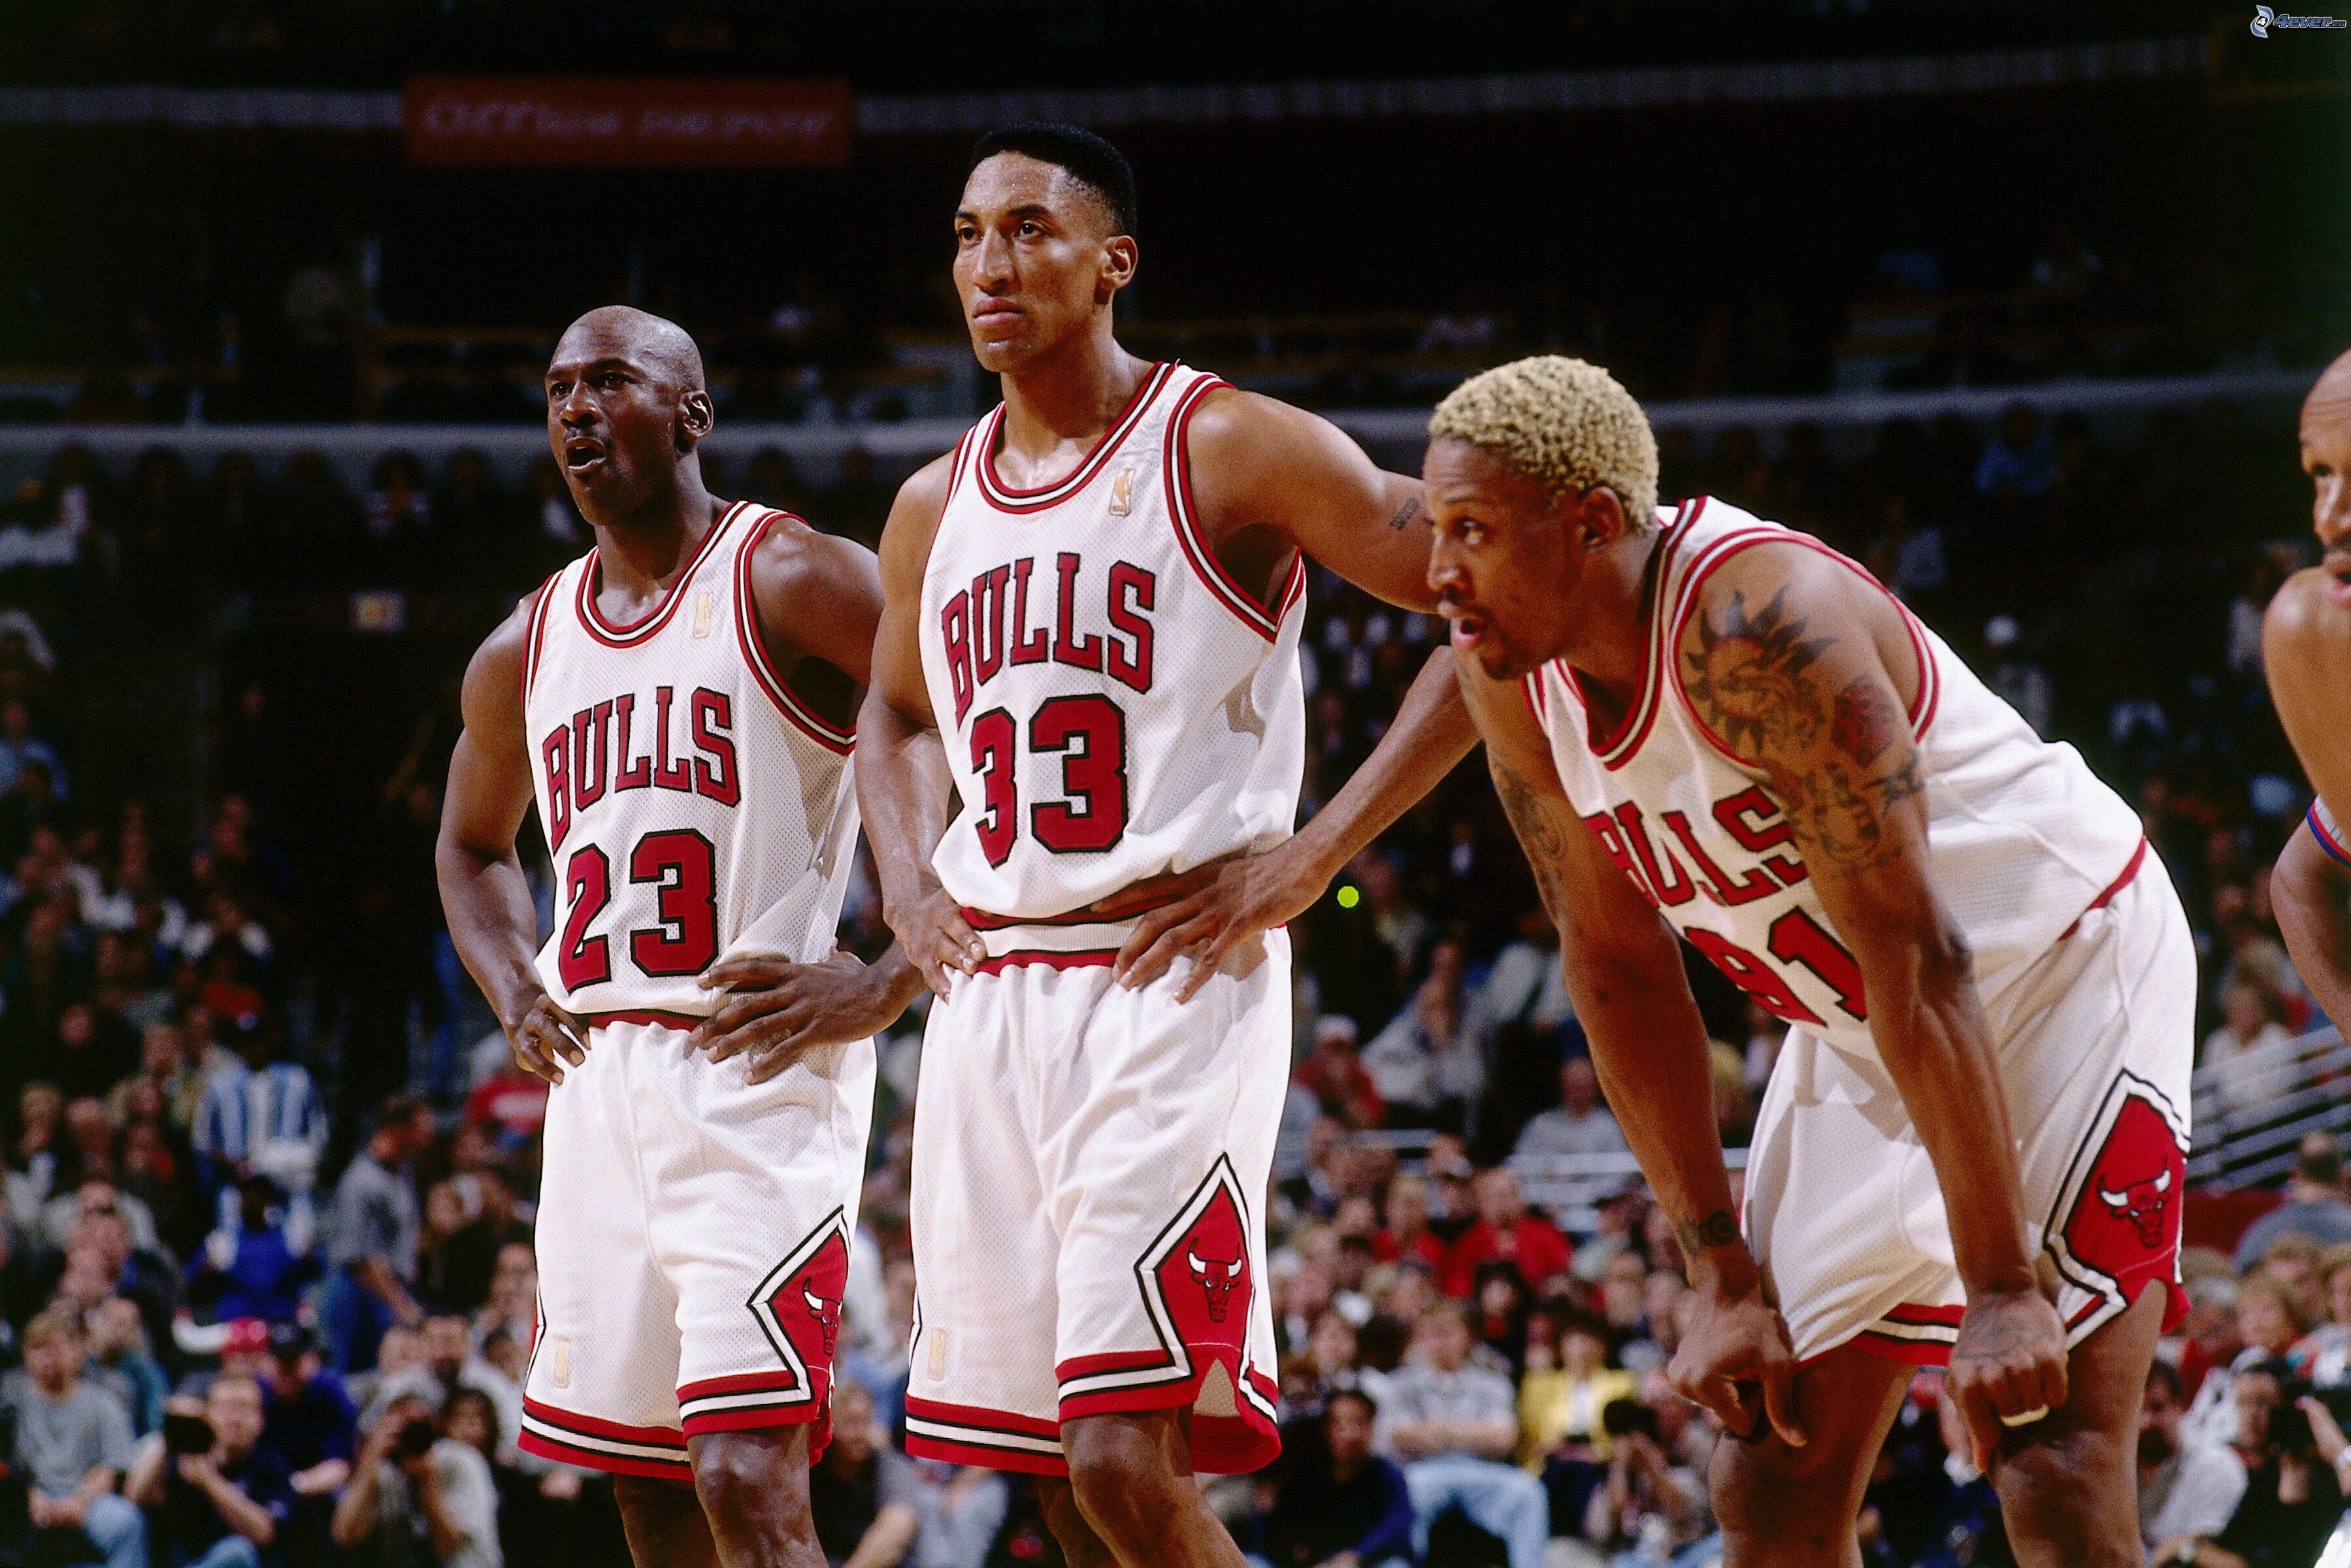 Wallpaper Sports Nba Chicago Bulls Michael Jordan Slam Dunk